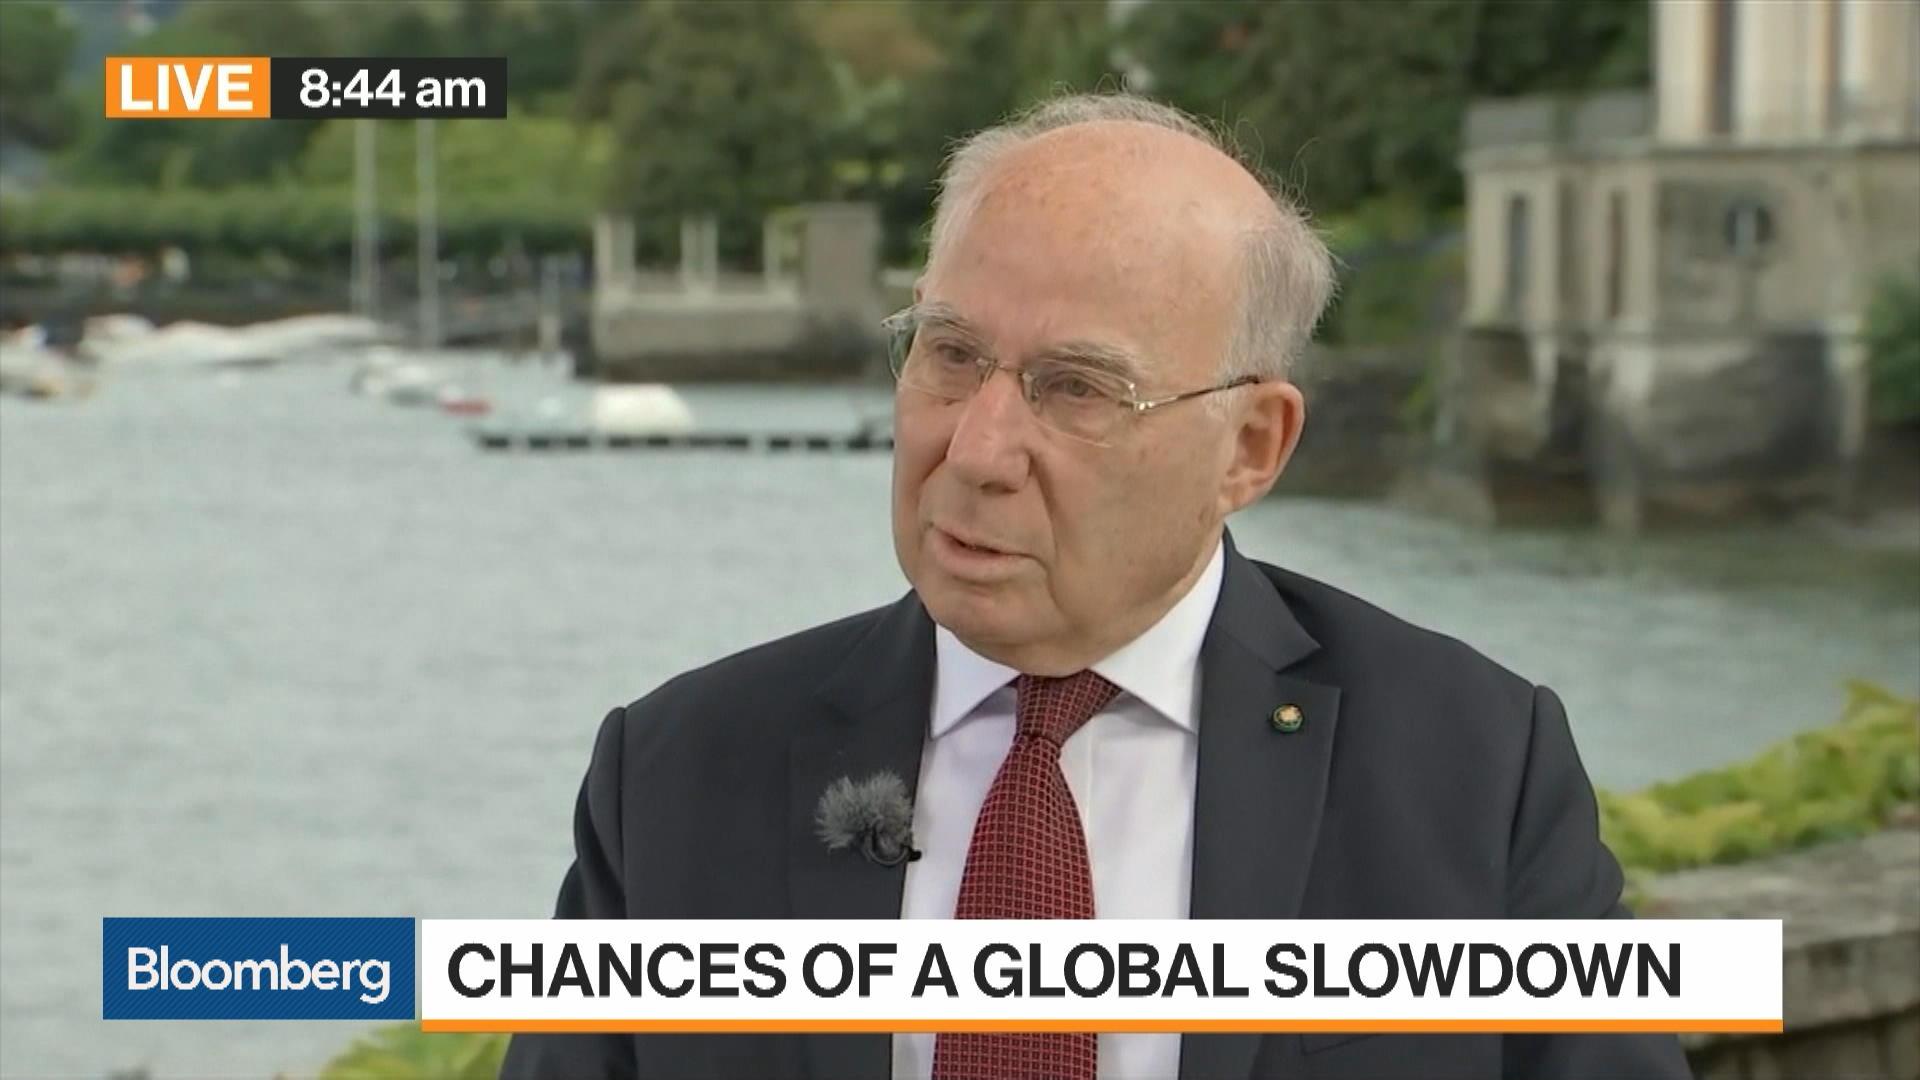 JPMorgan's Frenkel Says Monetary Policy Has Been Overburdened